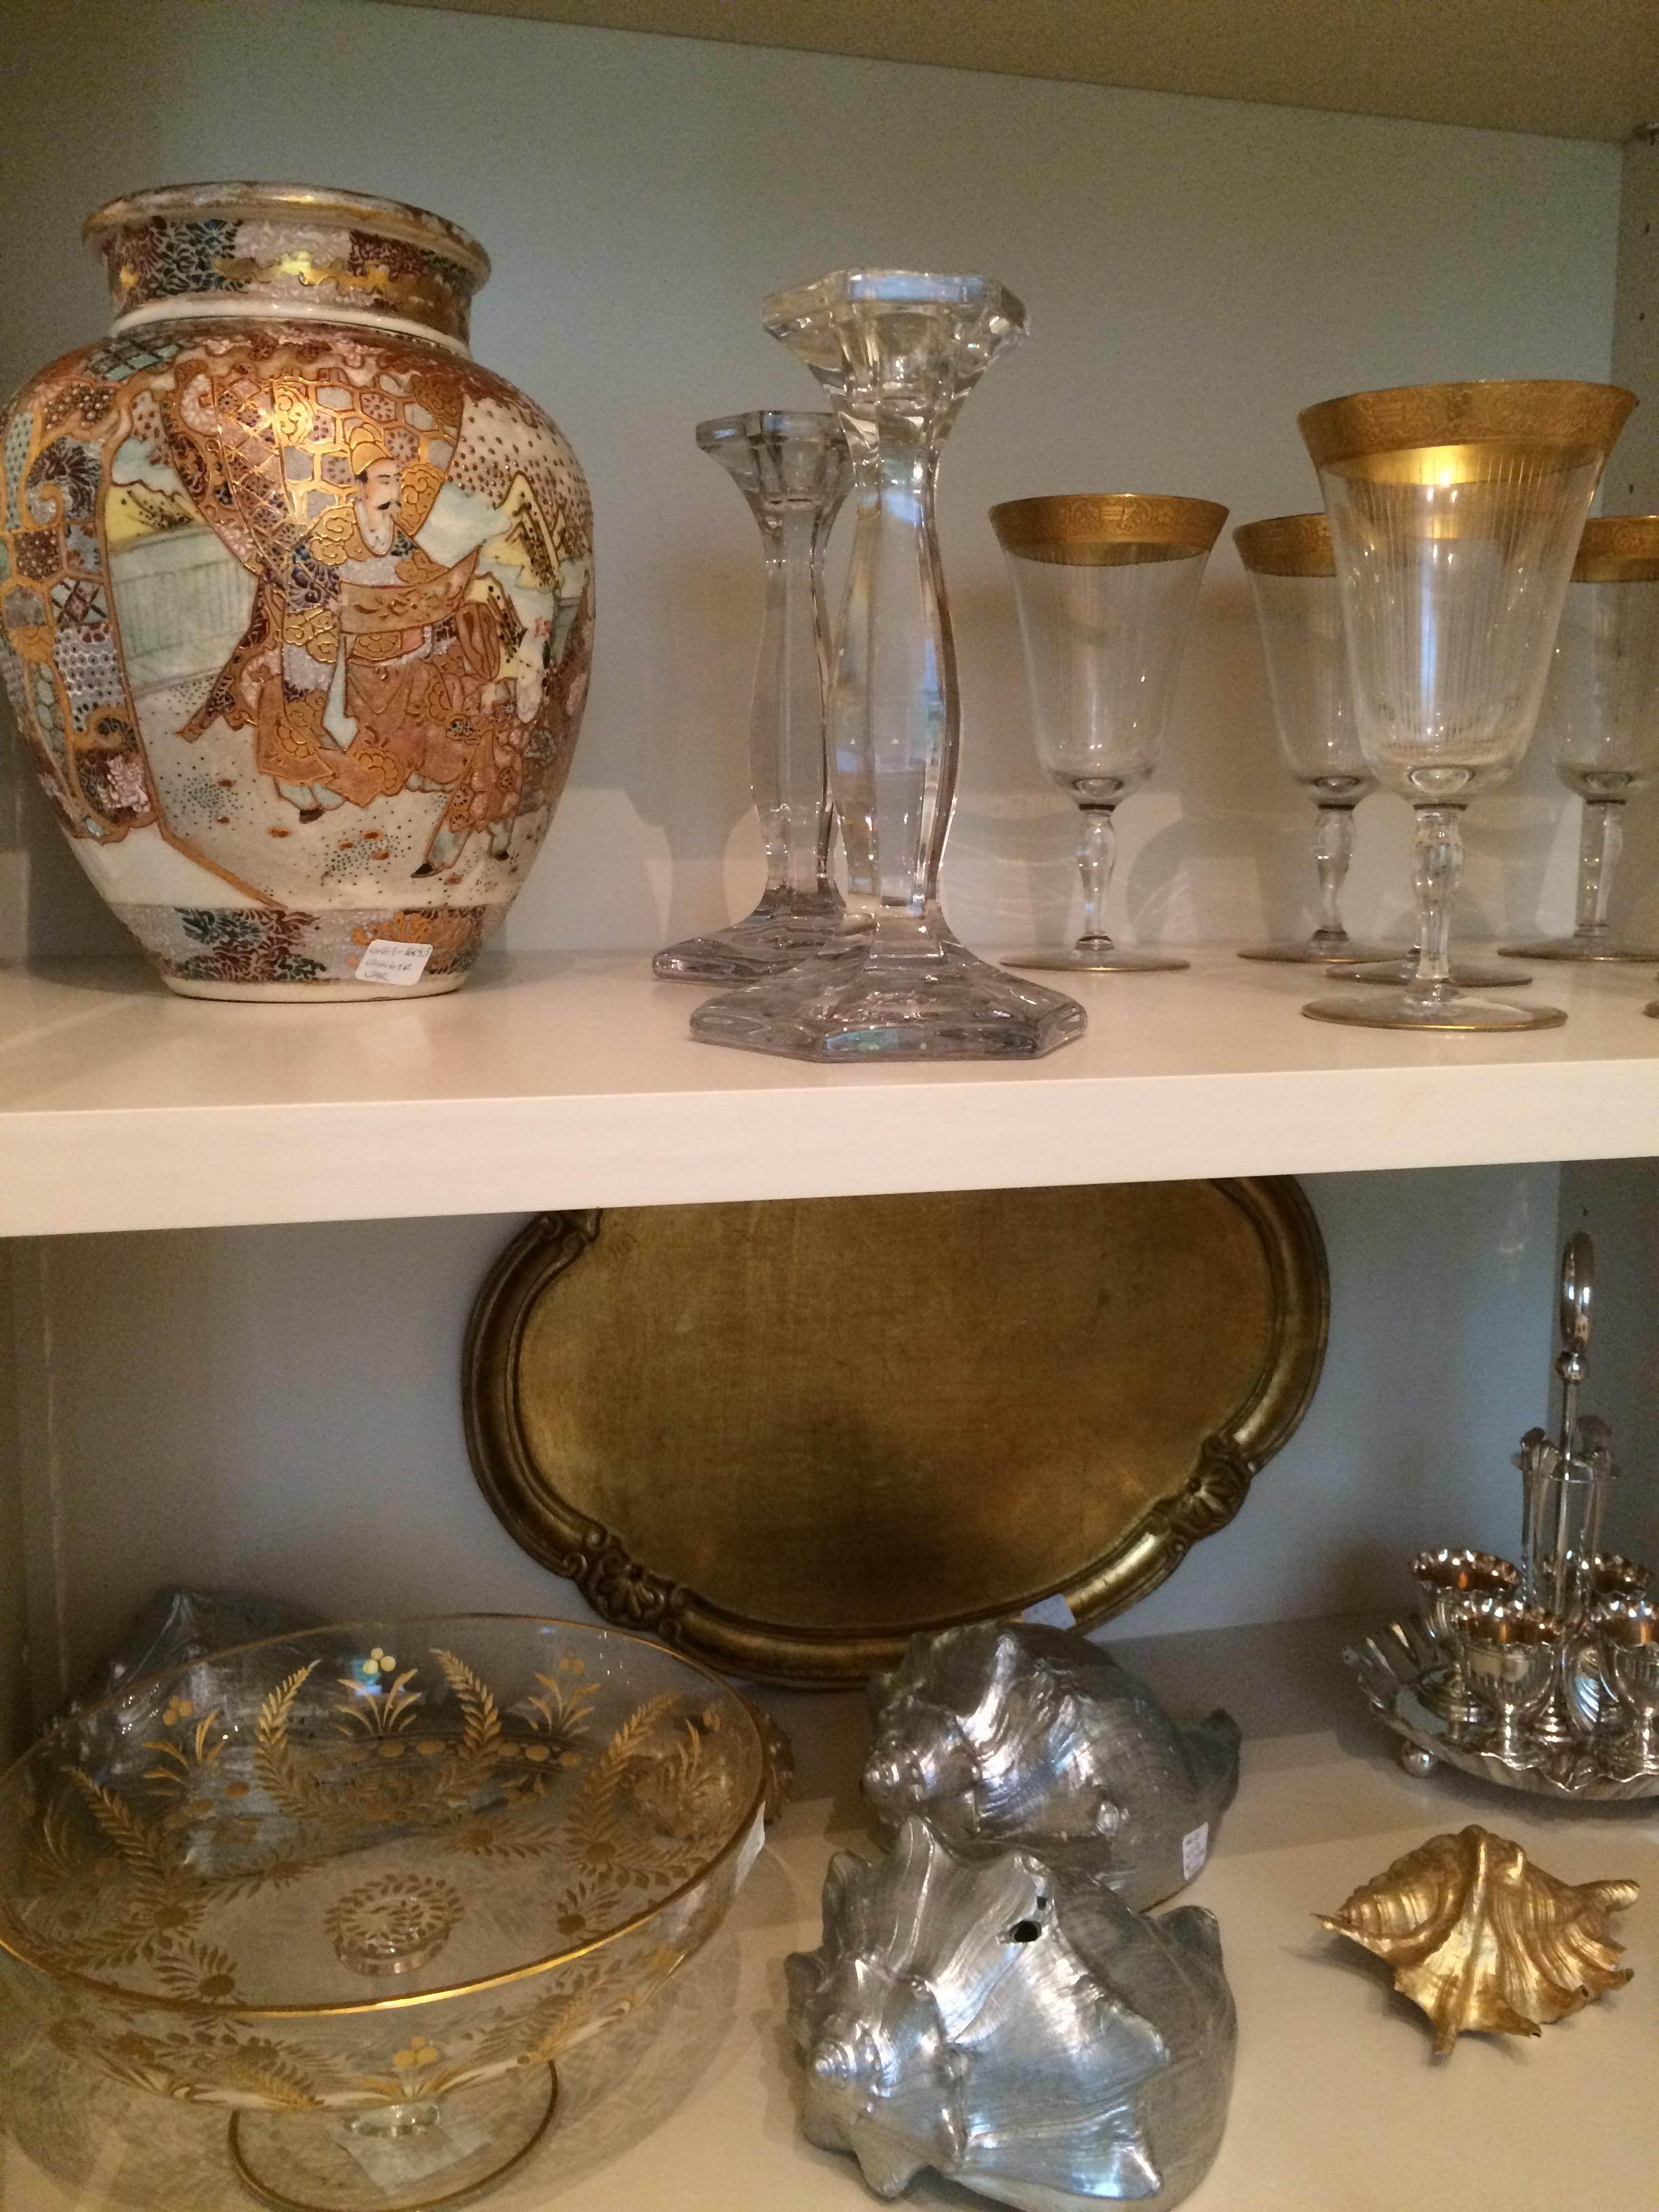 A ginger jar, candle sticks, gold rimmed stem ware, gilt trays and etc